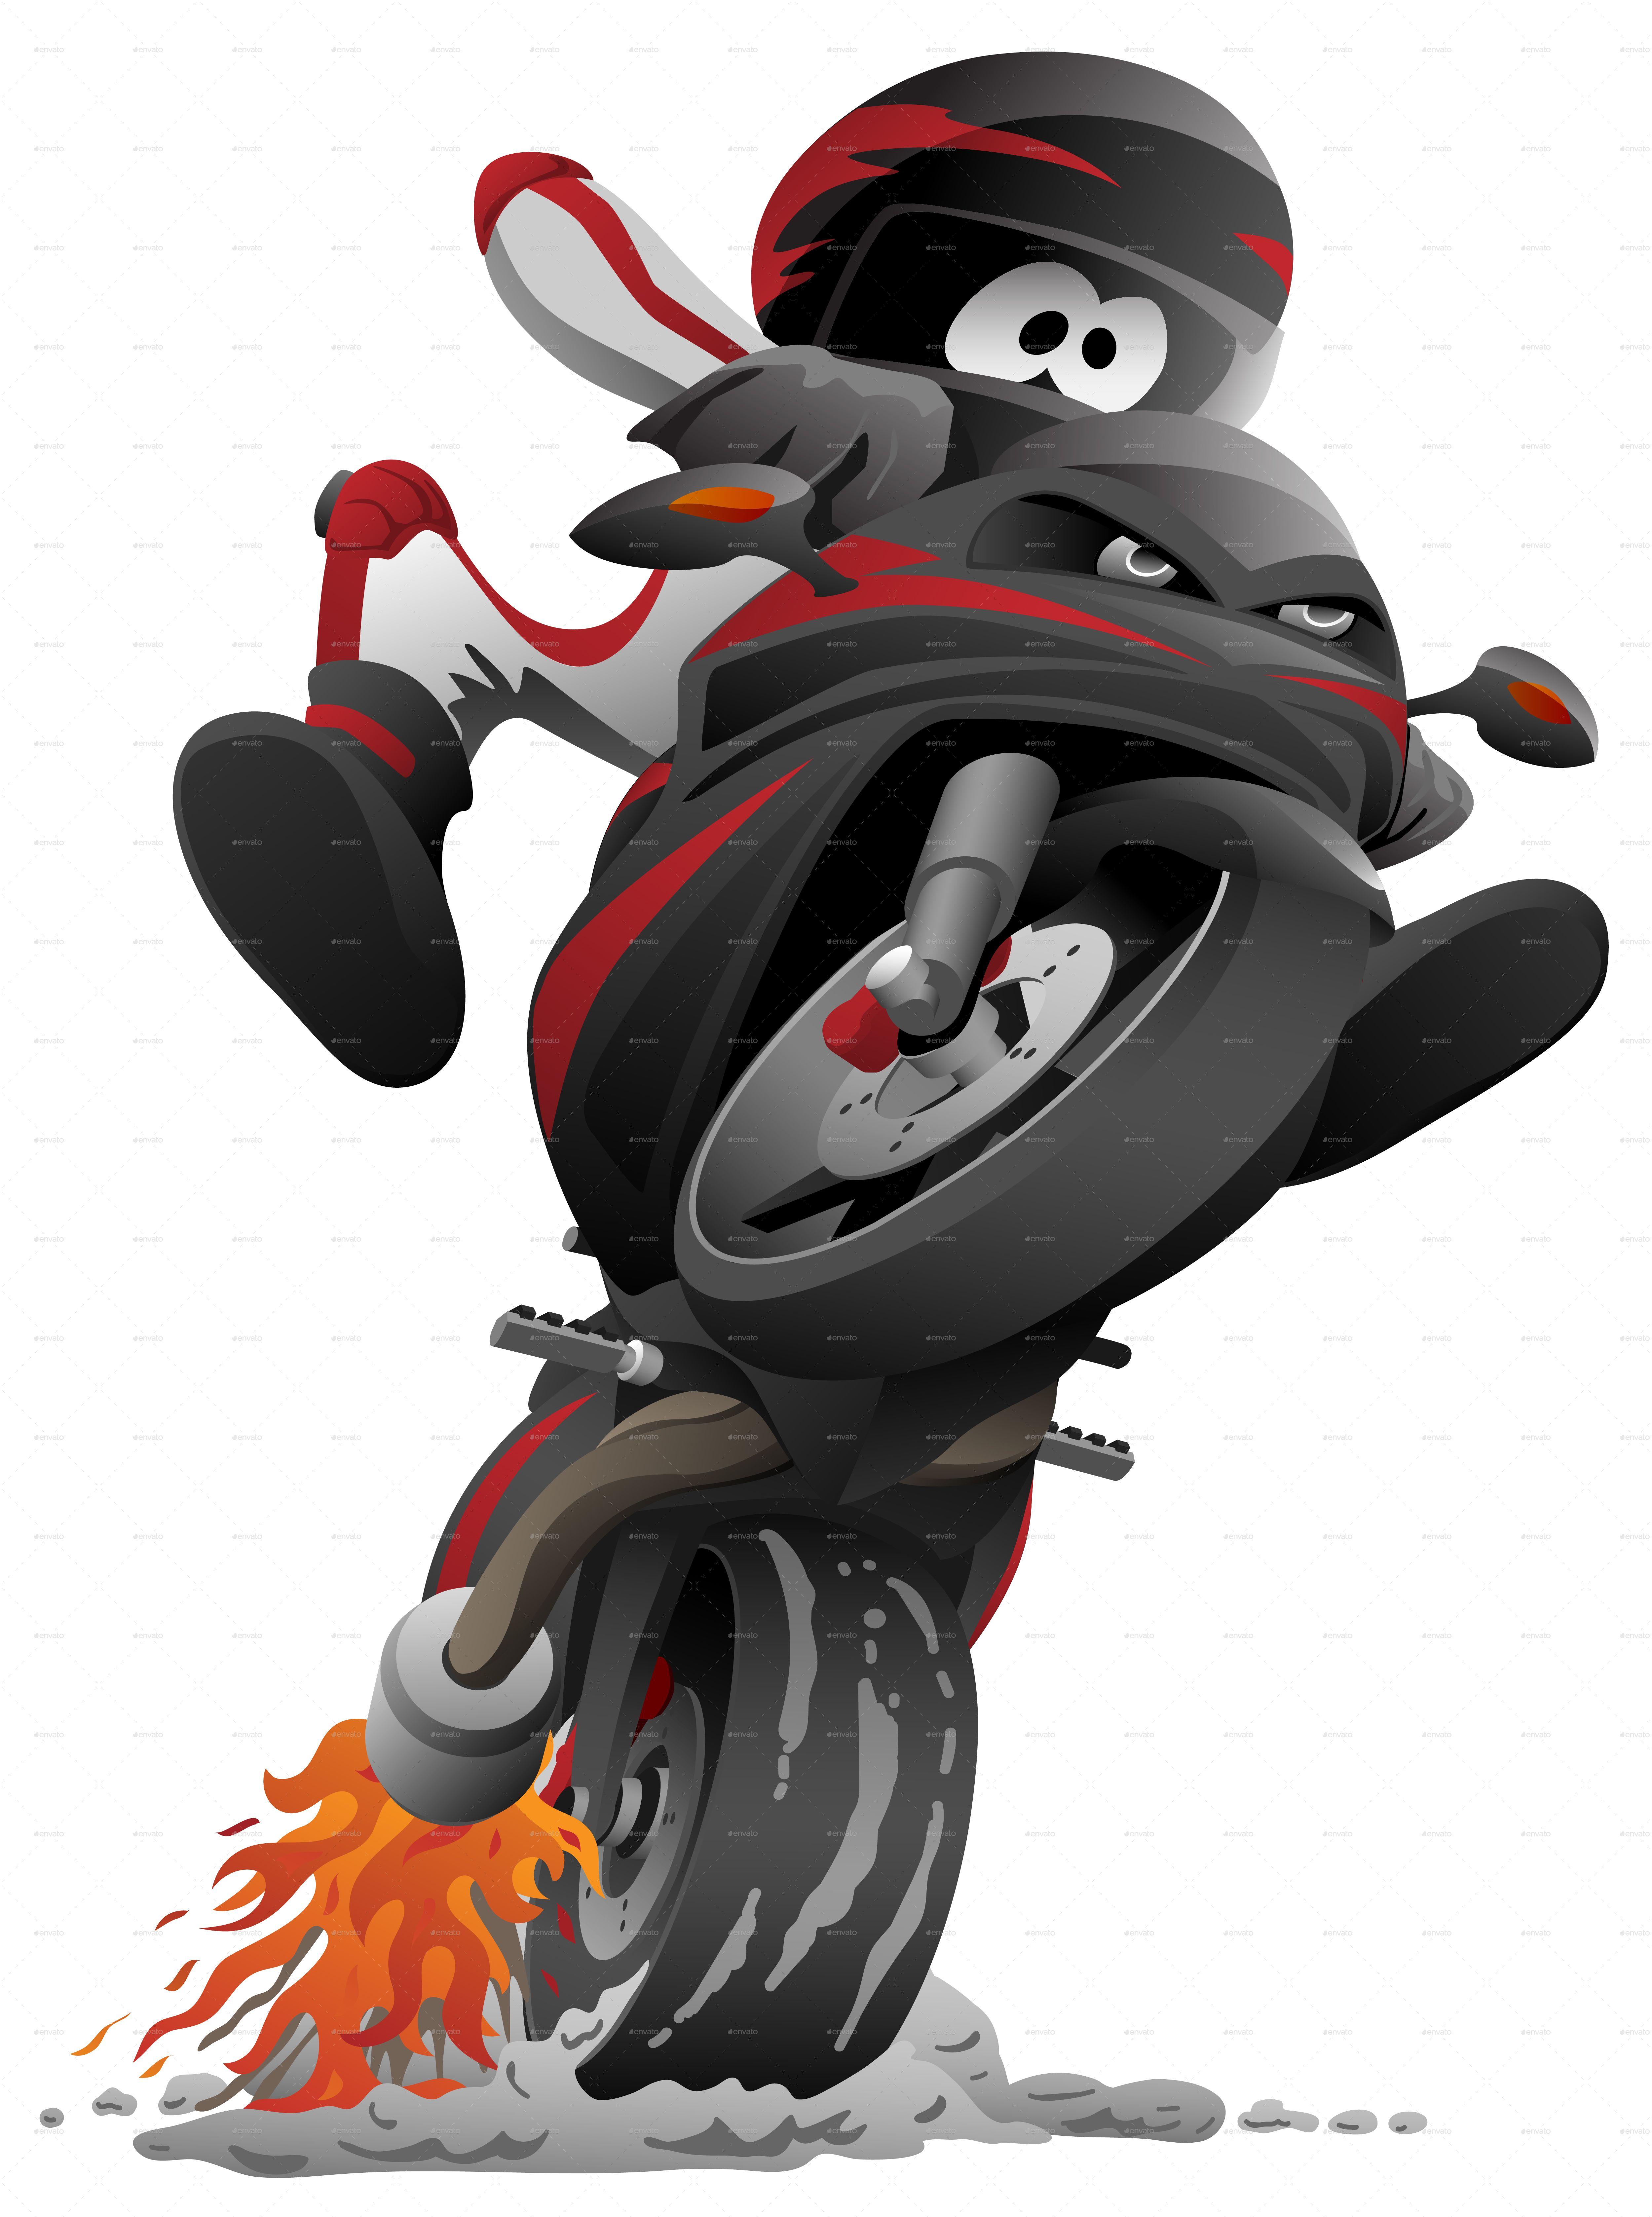 Sportbike Motorcycle Vector Sports Bikes Motorcycles Sport